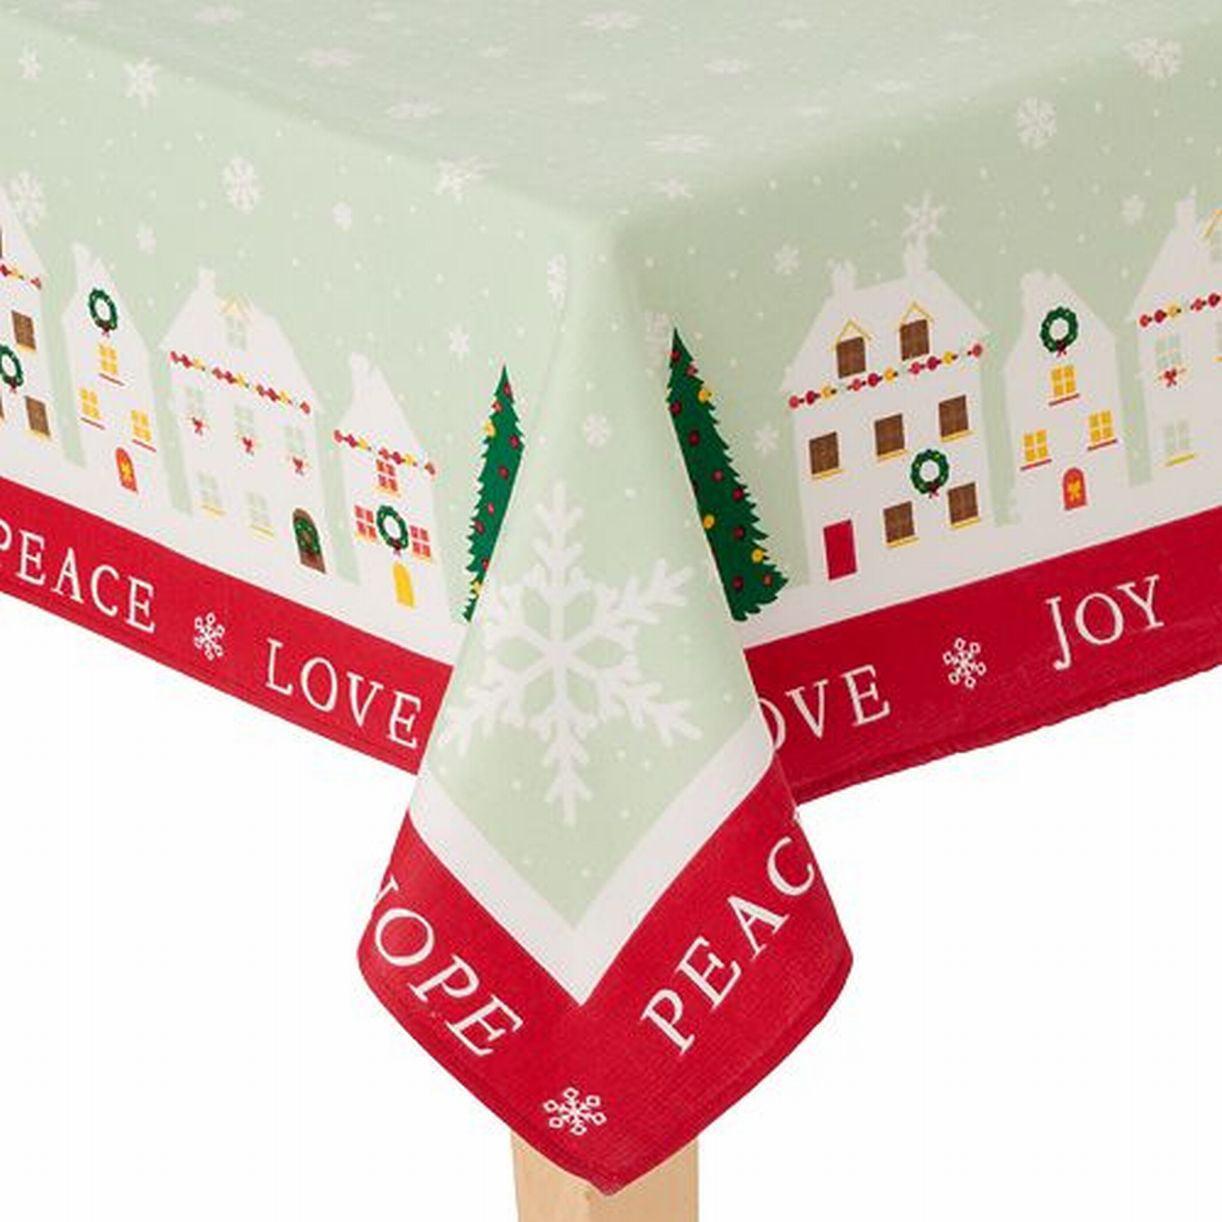 St Nicholas Square Green Christmas Village Tablecloth Table Cloth 60x102 Ob